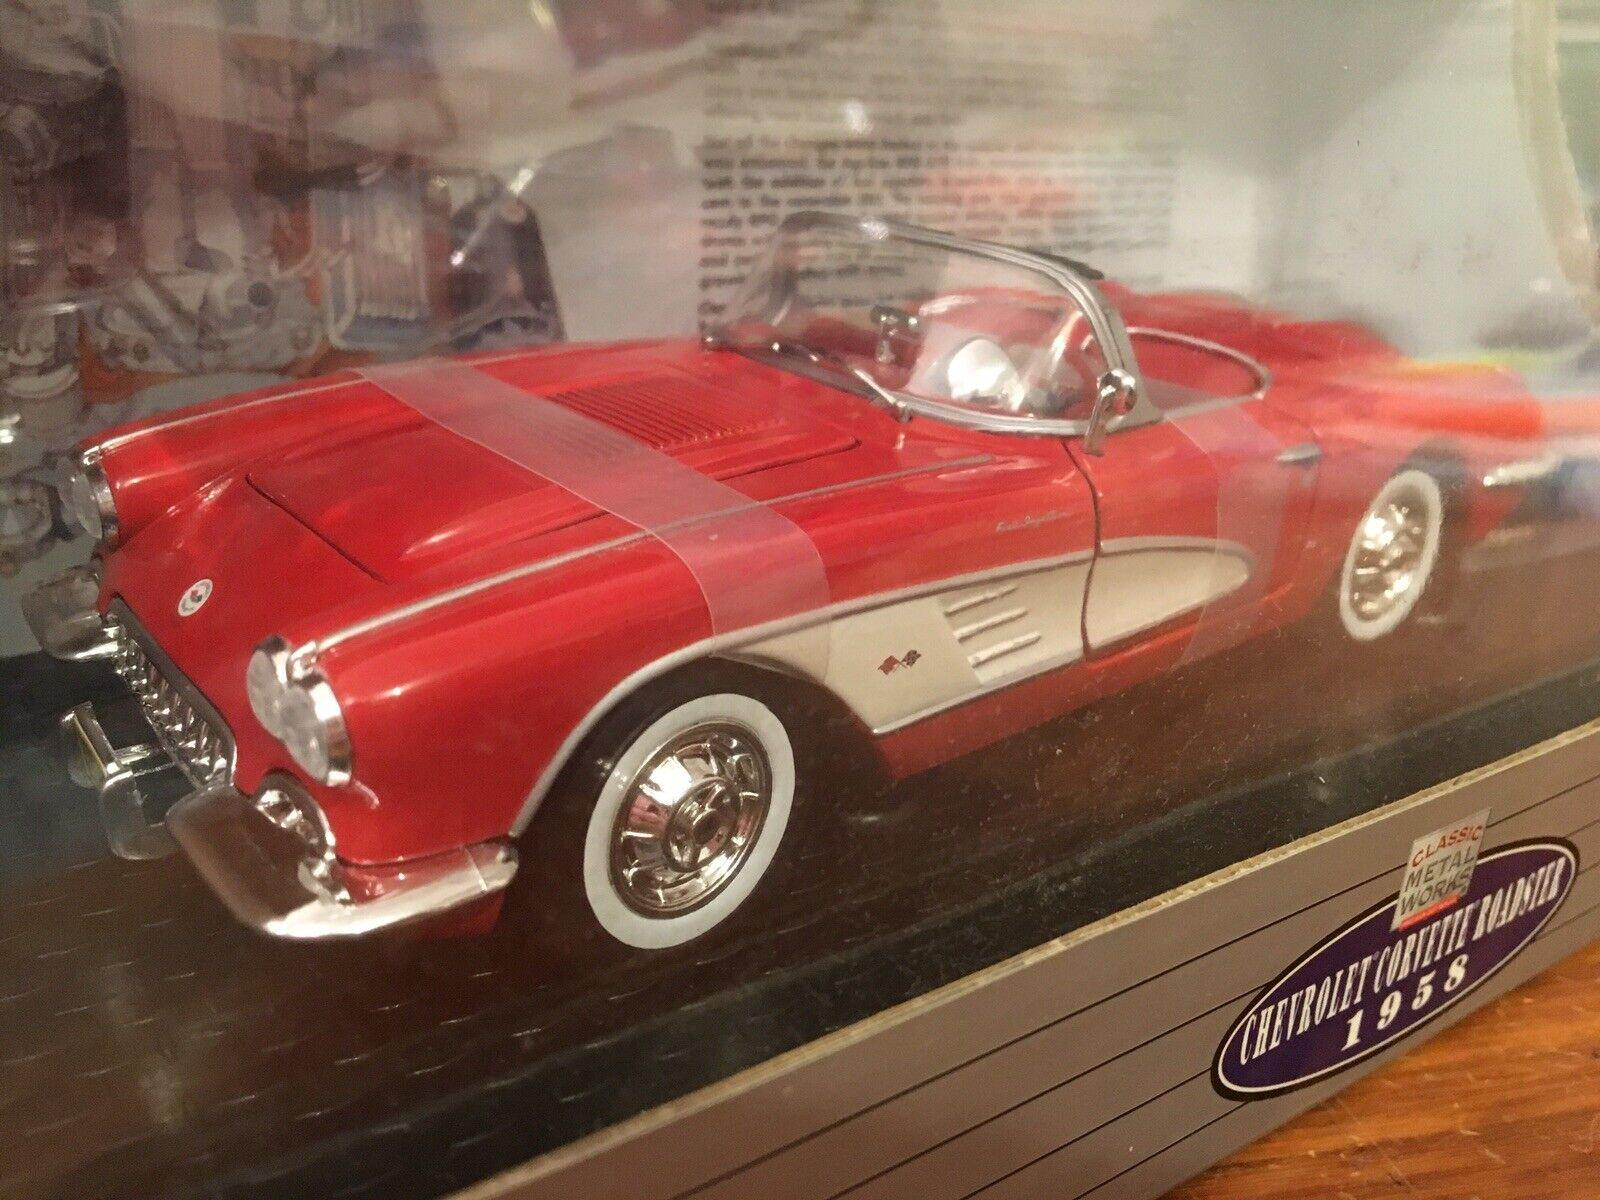 Classic Metal Works 1 24 1958 Chevrolet Corvette Fuelie Rojo, Artículo 58819